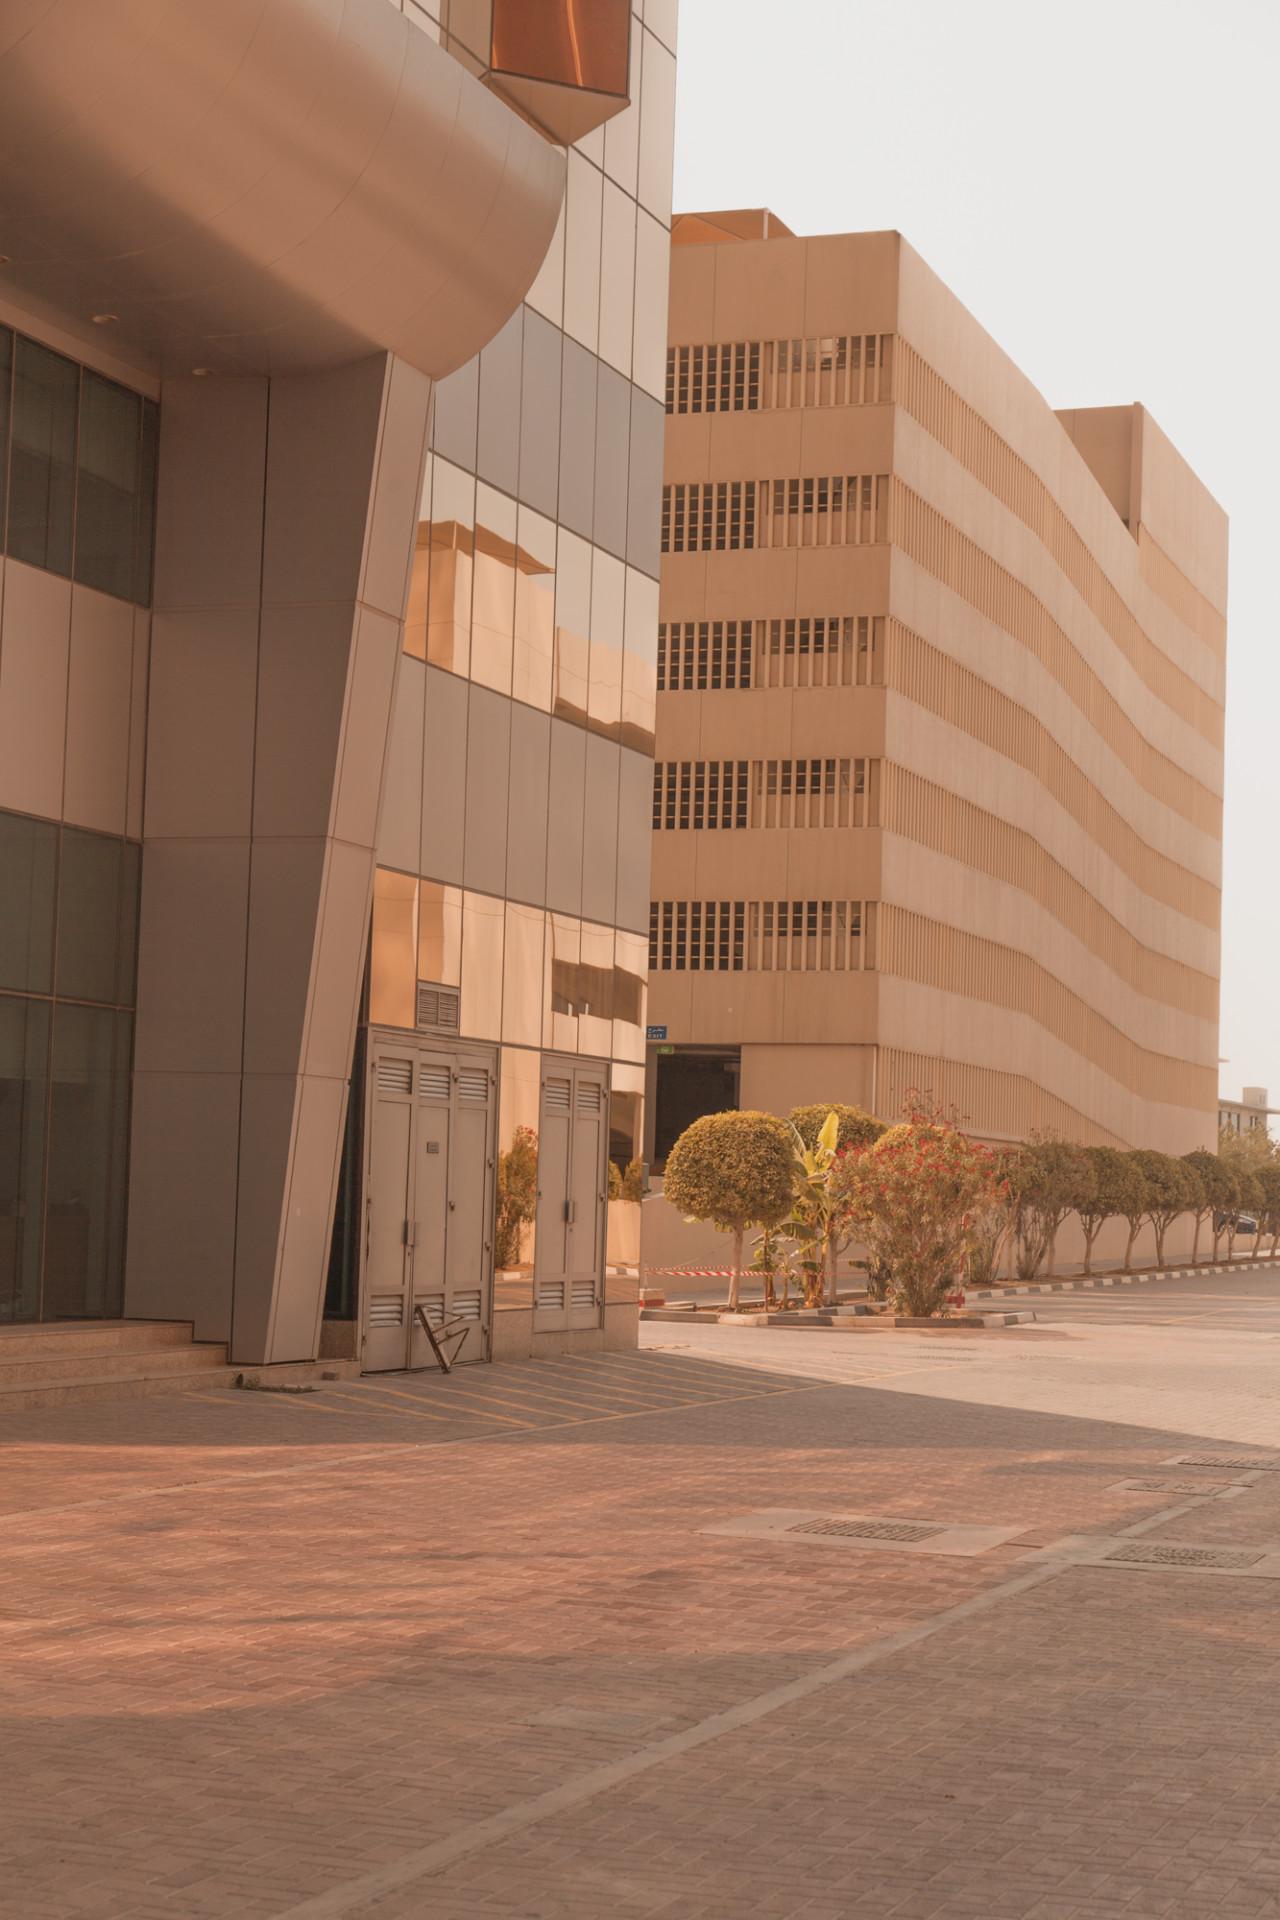 Neven Allgeier & Benedikt Fischer Dubai City for SPIKE Art Quarterly